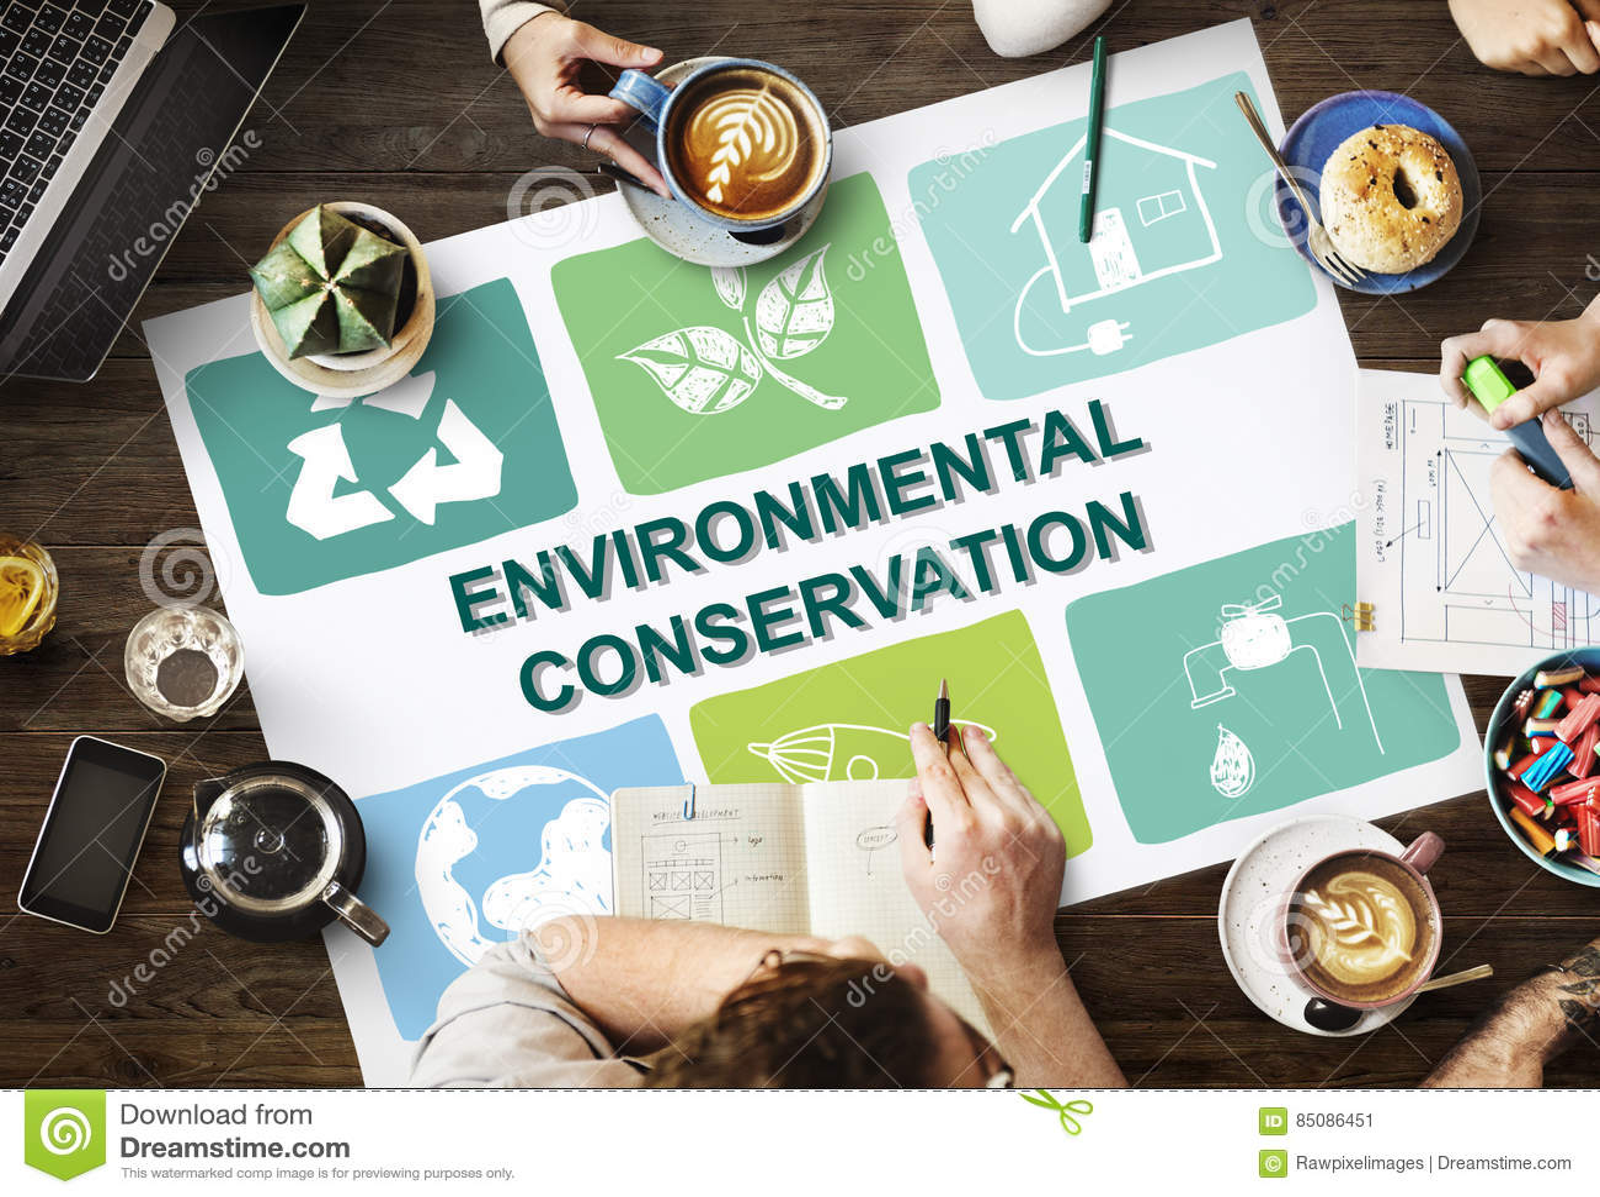 Экологический рост c предохранения от консервации жизни консервации